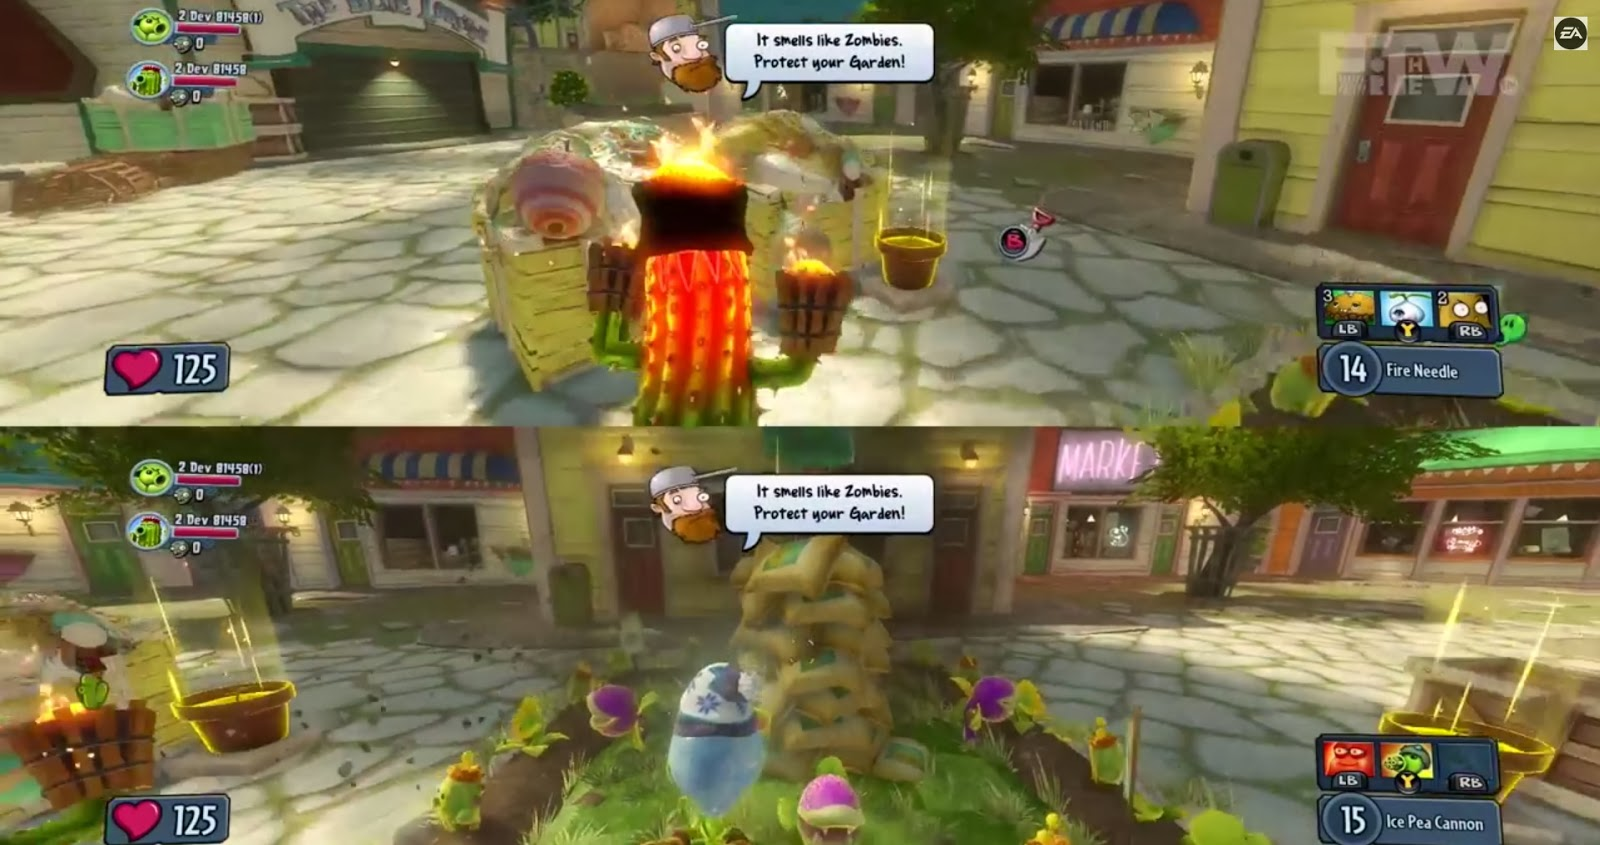 Plants Vs Zombies Garden Warfare Multiplayer - [aragundem.com]